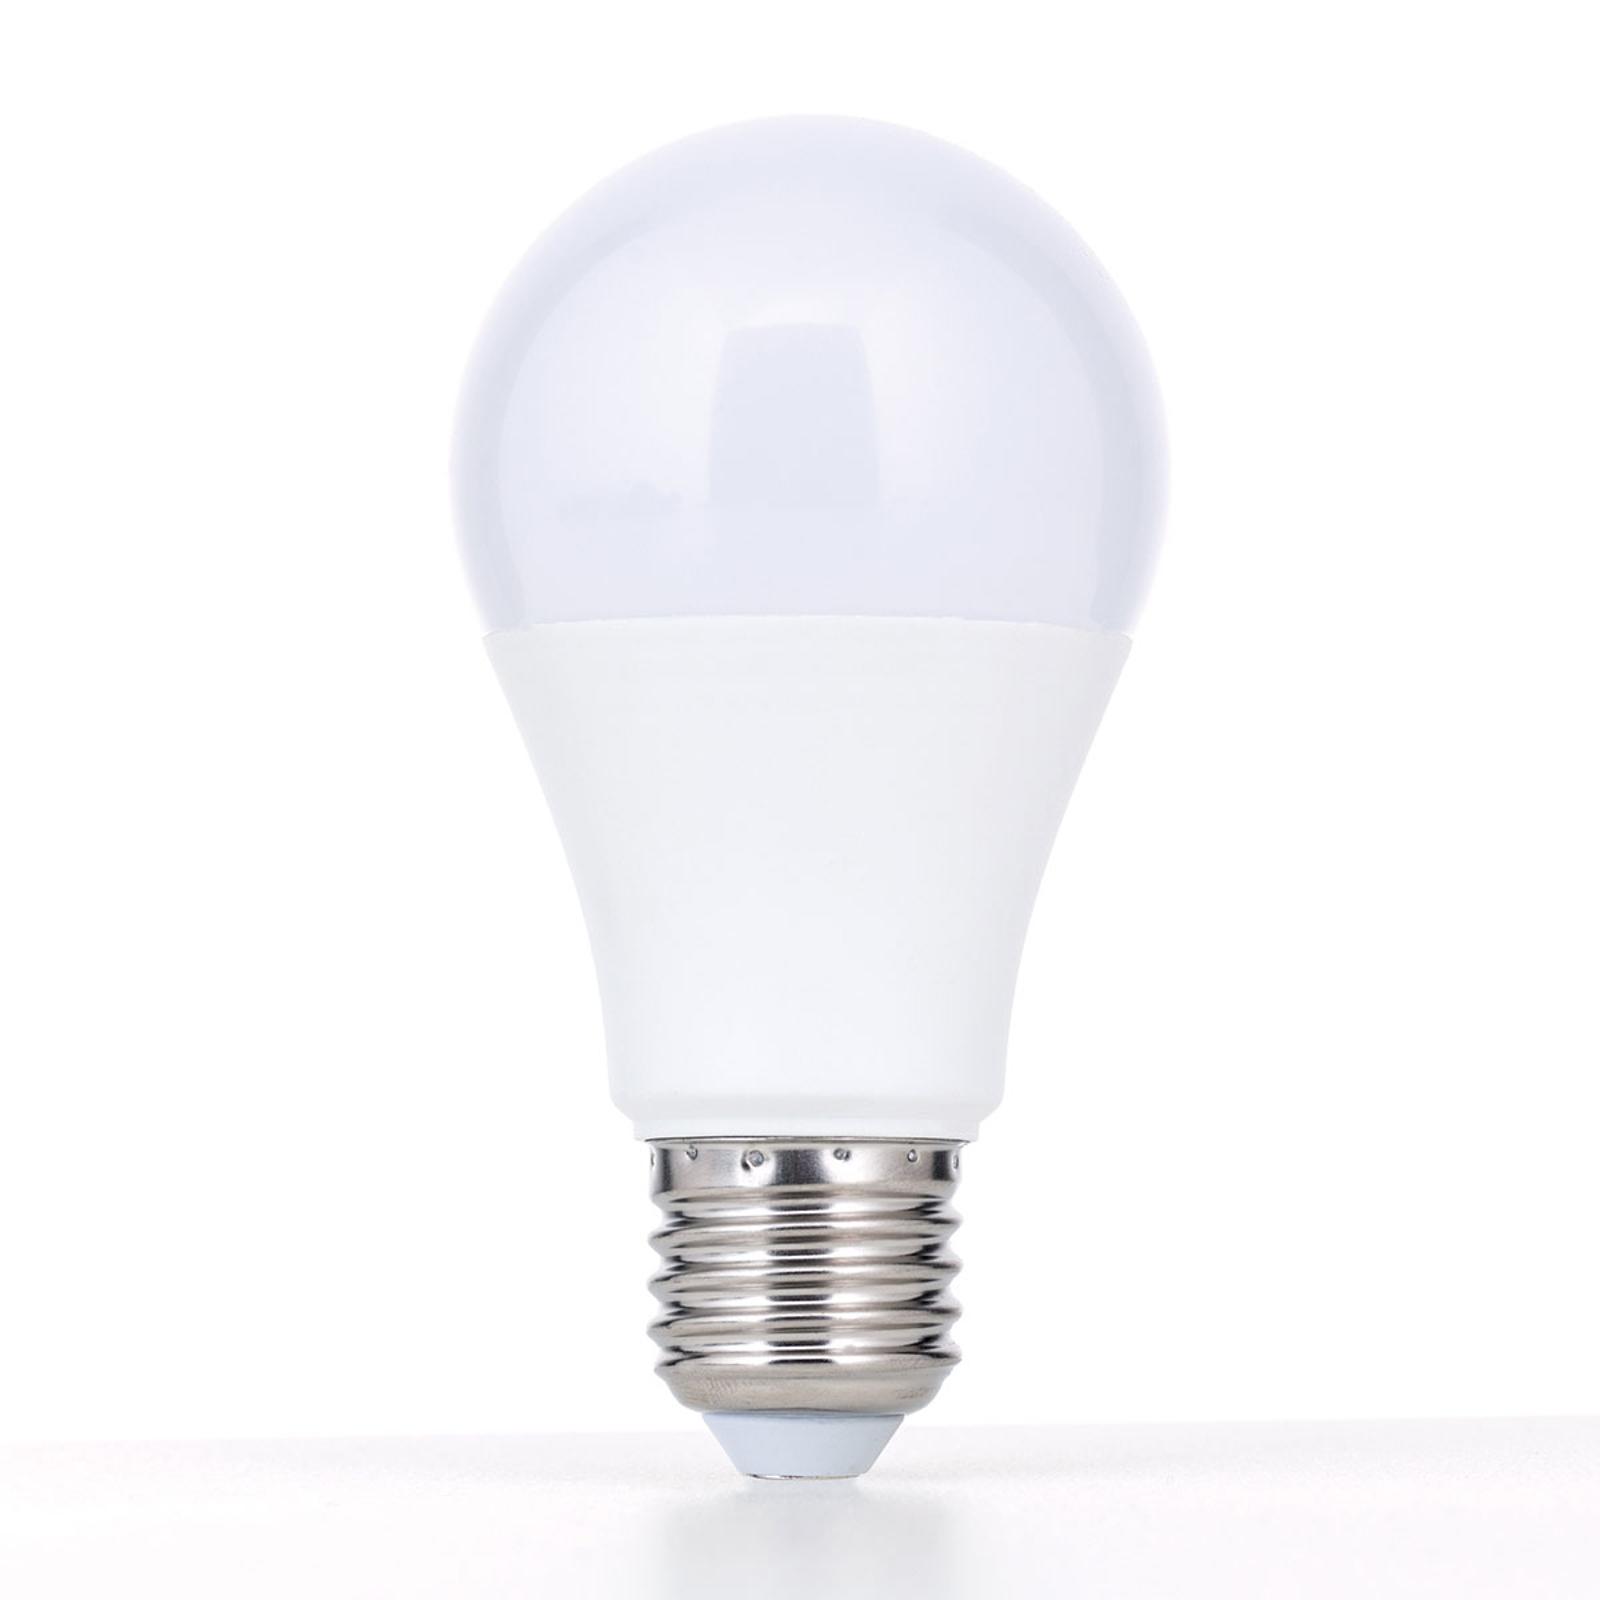 E27 bombilla LED 5W blanco cálido, no atenuable